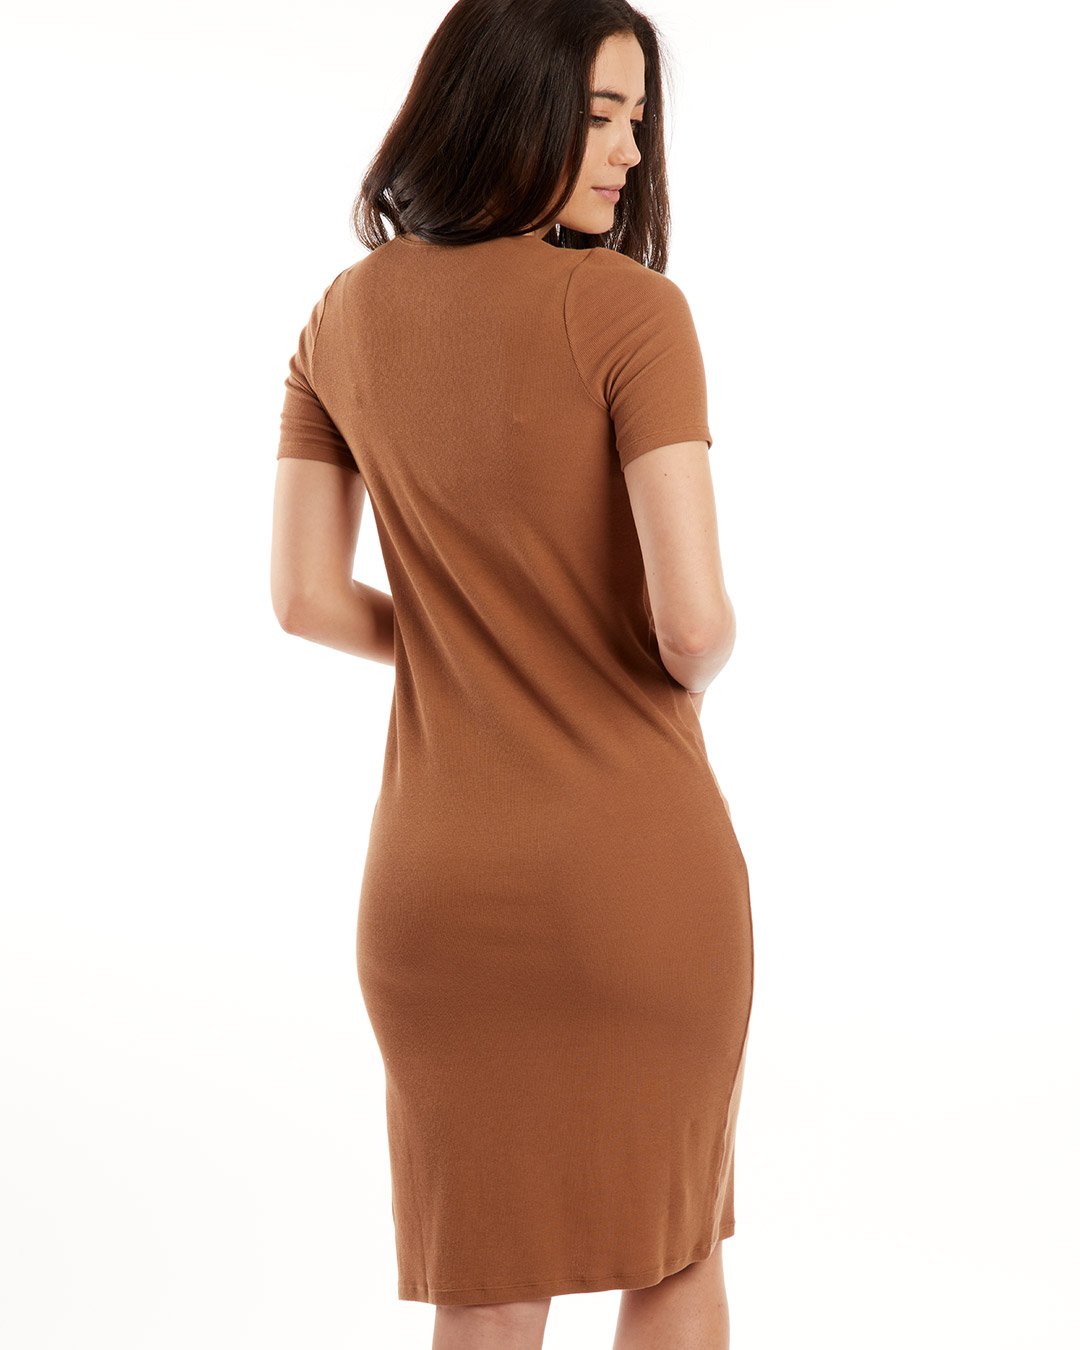 paper-label-shiloh-dress-timber-tan-back-dianes-lingerie-vancouver-1080x1350